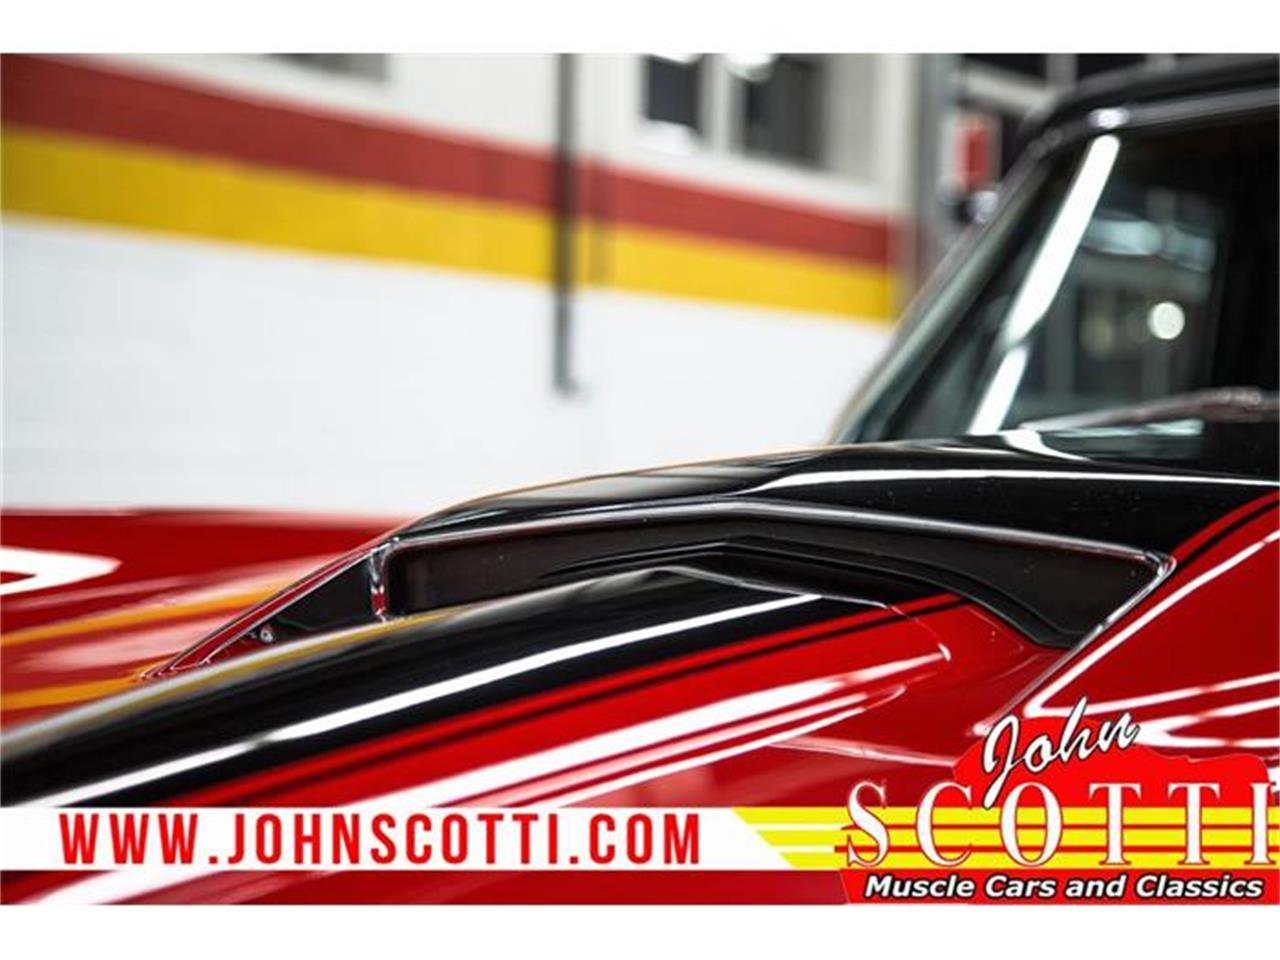 Large Picture of Classic '67 Chevrolet Corvette - $59,990.00 - GA0F